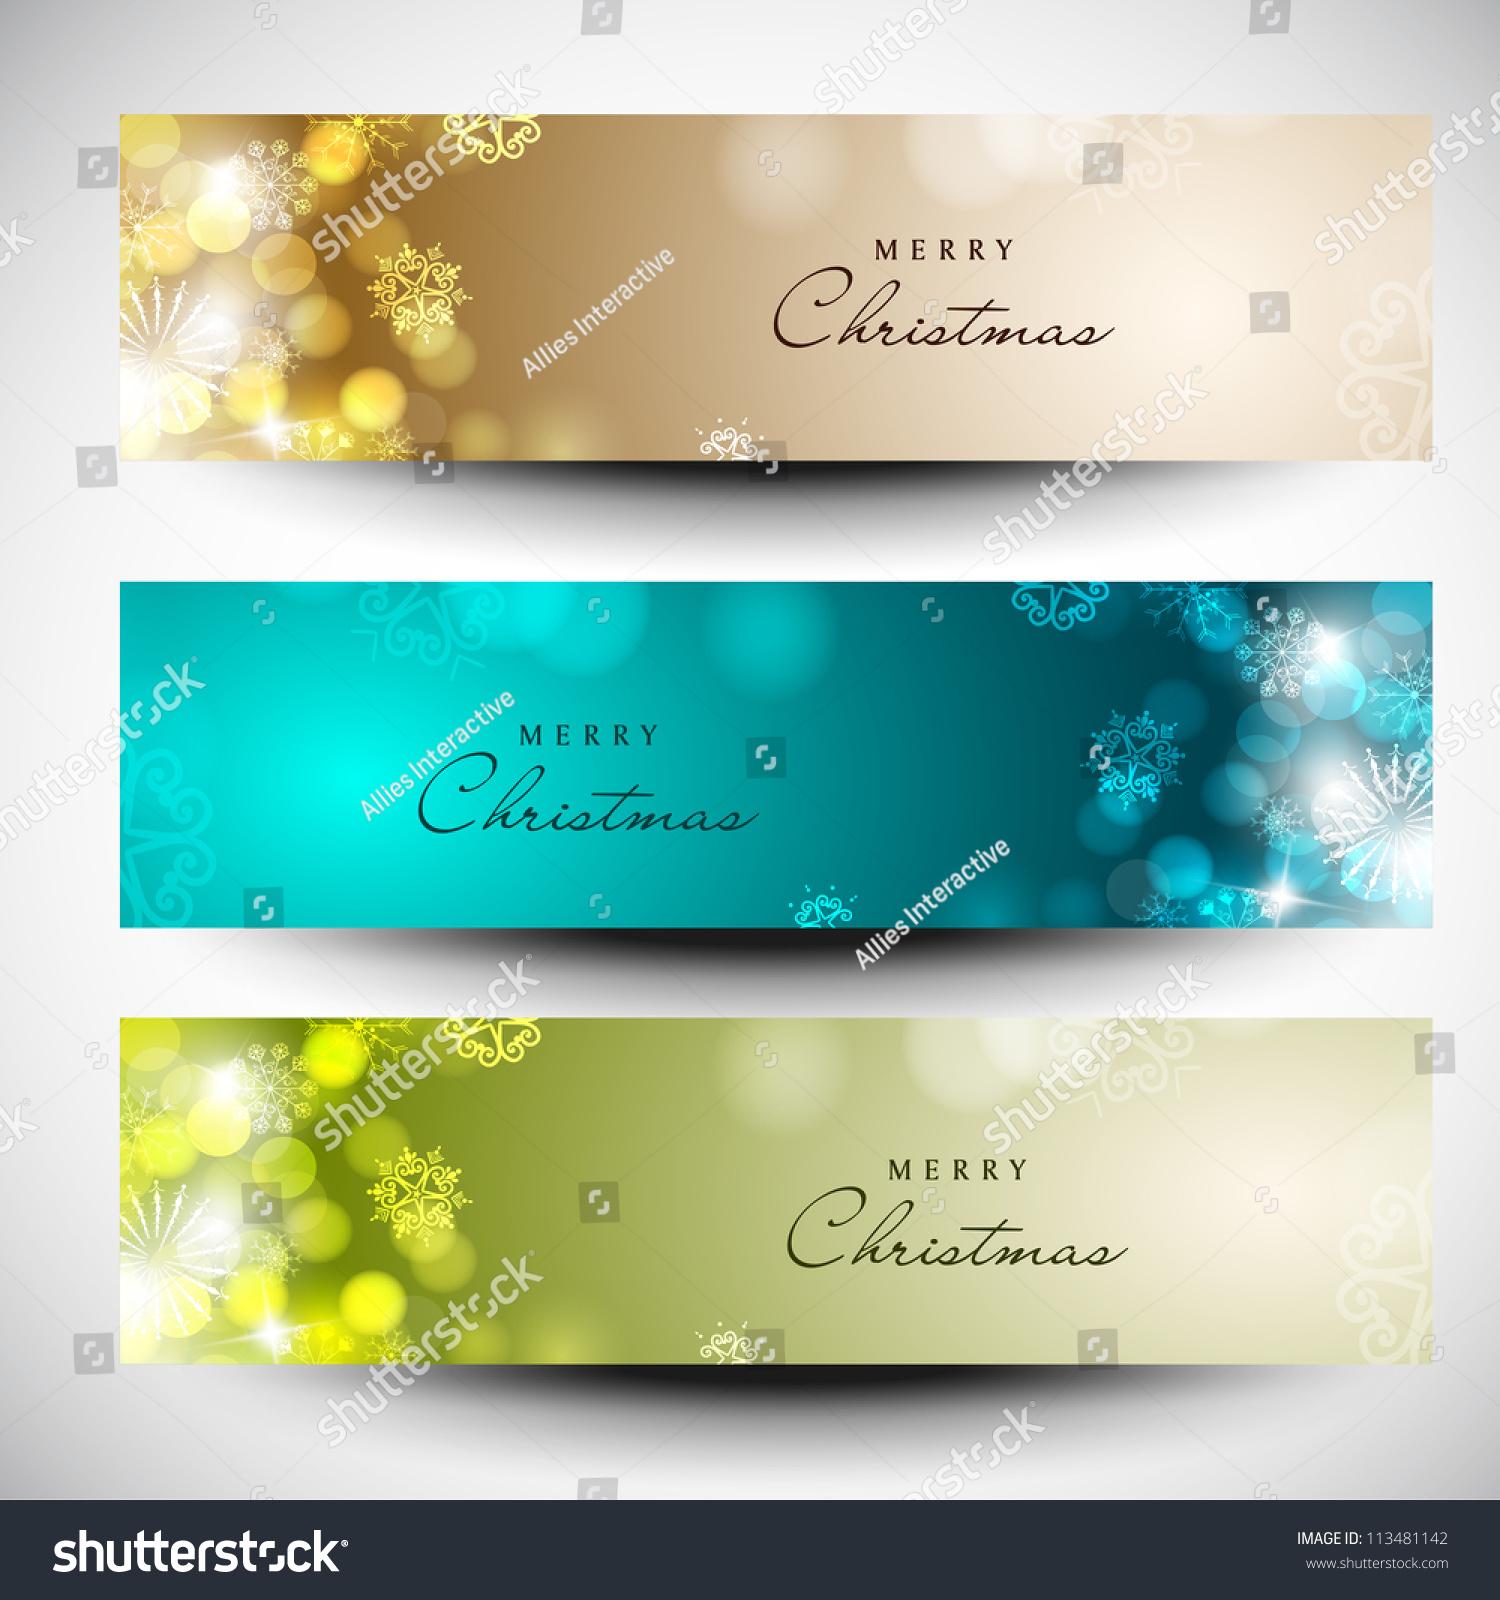 Merry Christmas Headings Stock Vector Merry Christmas Website Header And Banner